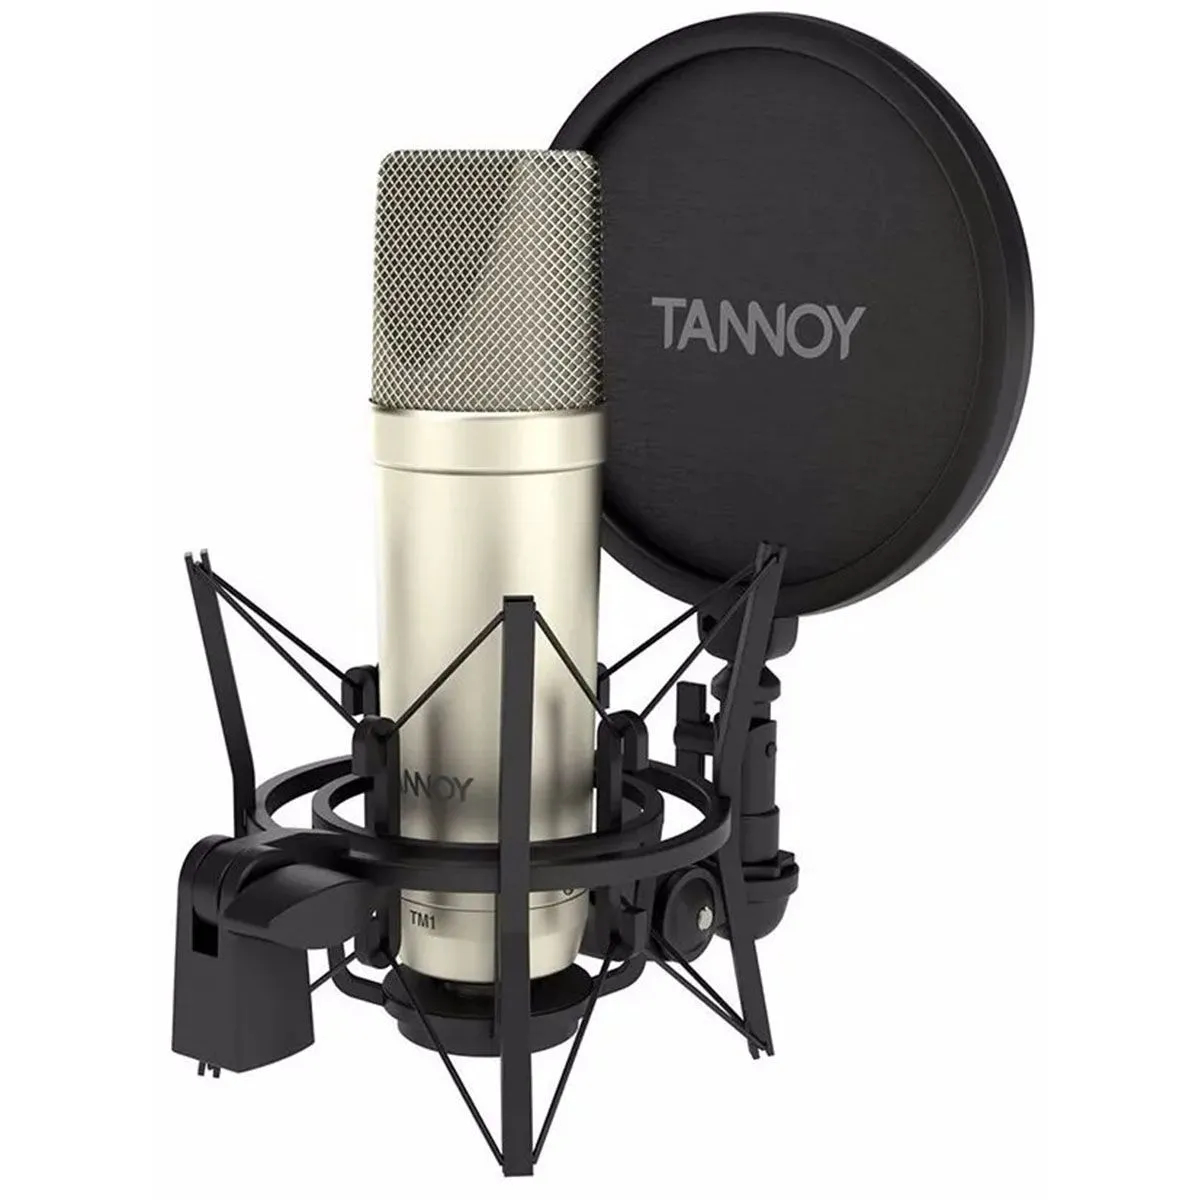 Microfone Condensador Tannoy TM1 Studio